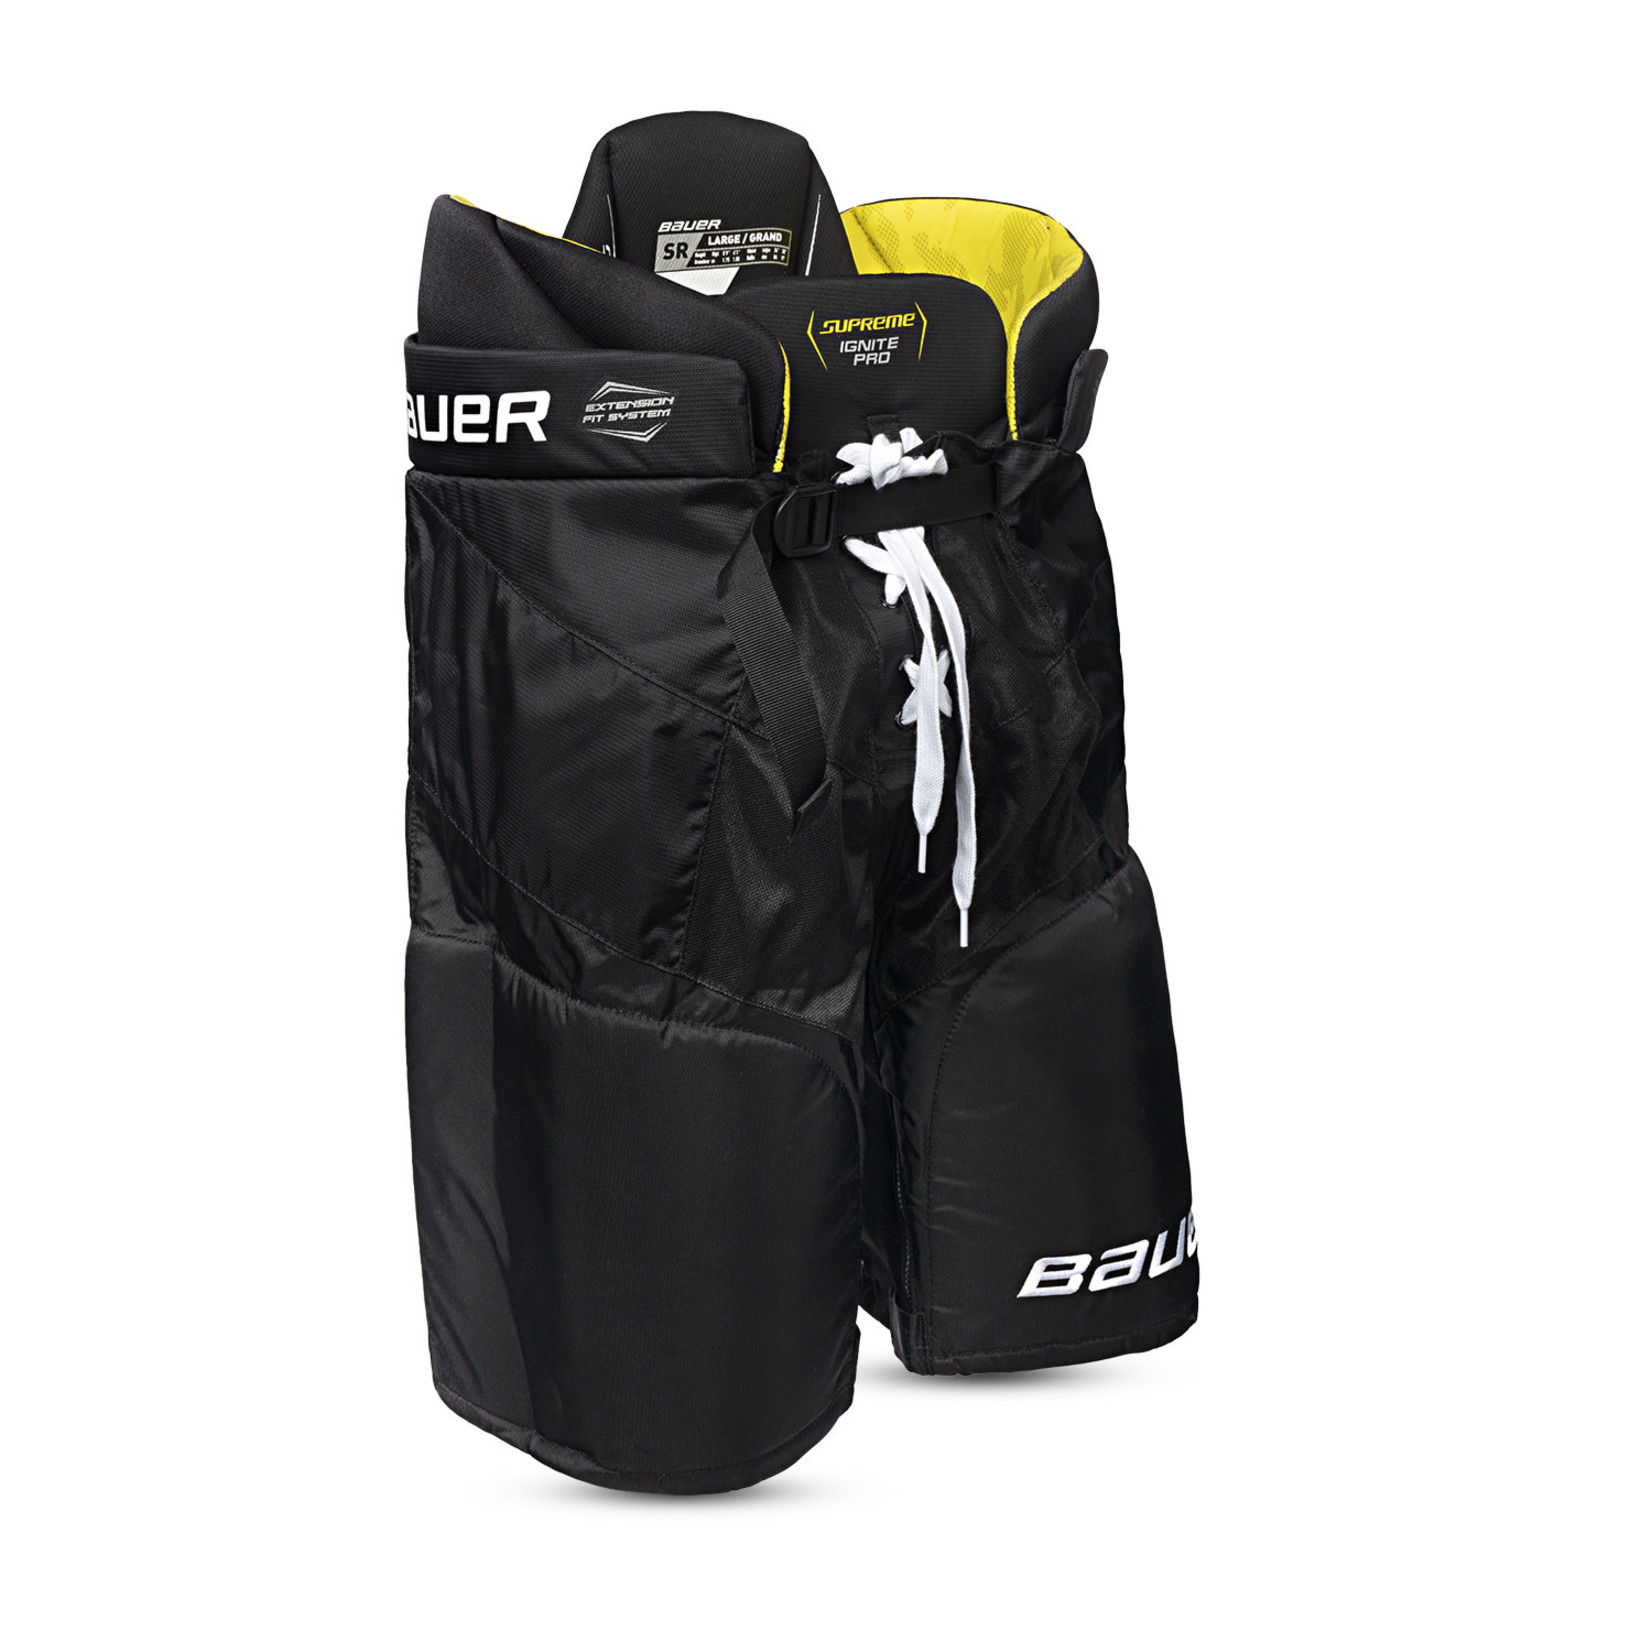 Bauer Bauer Hockey Pants, Supreme Ignite Pro, Senior